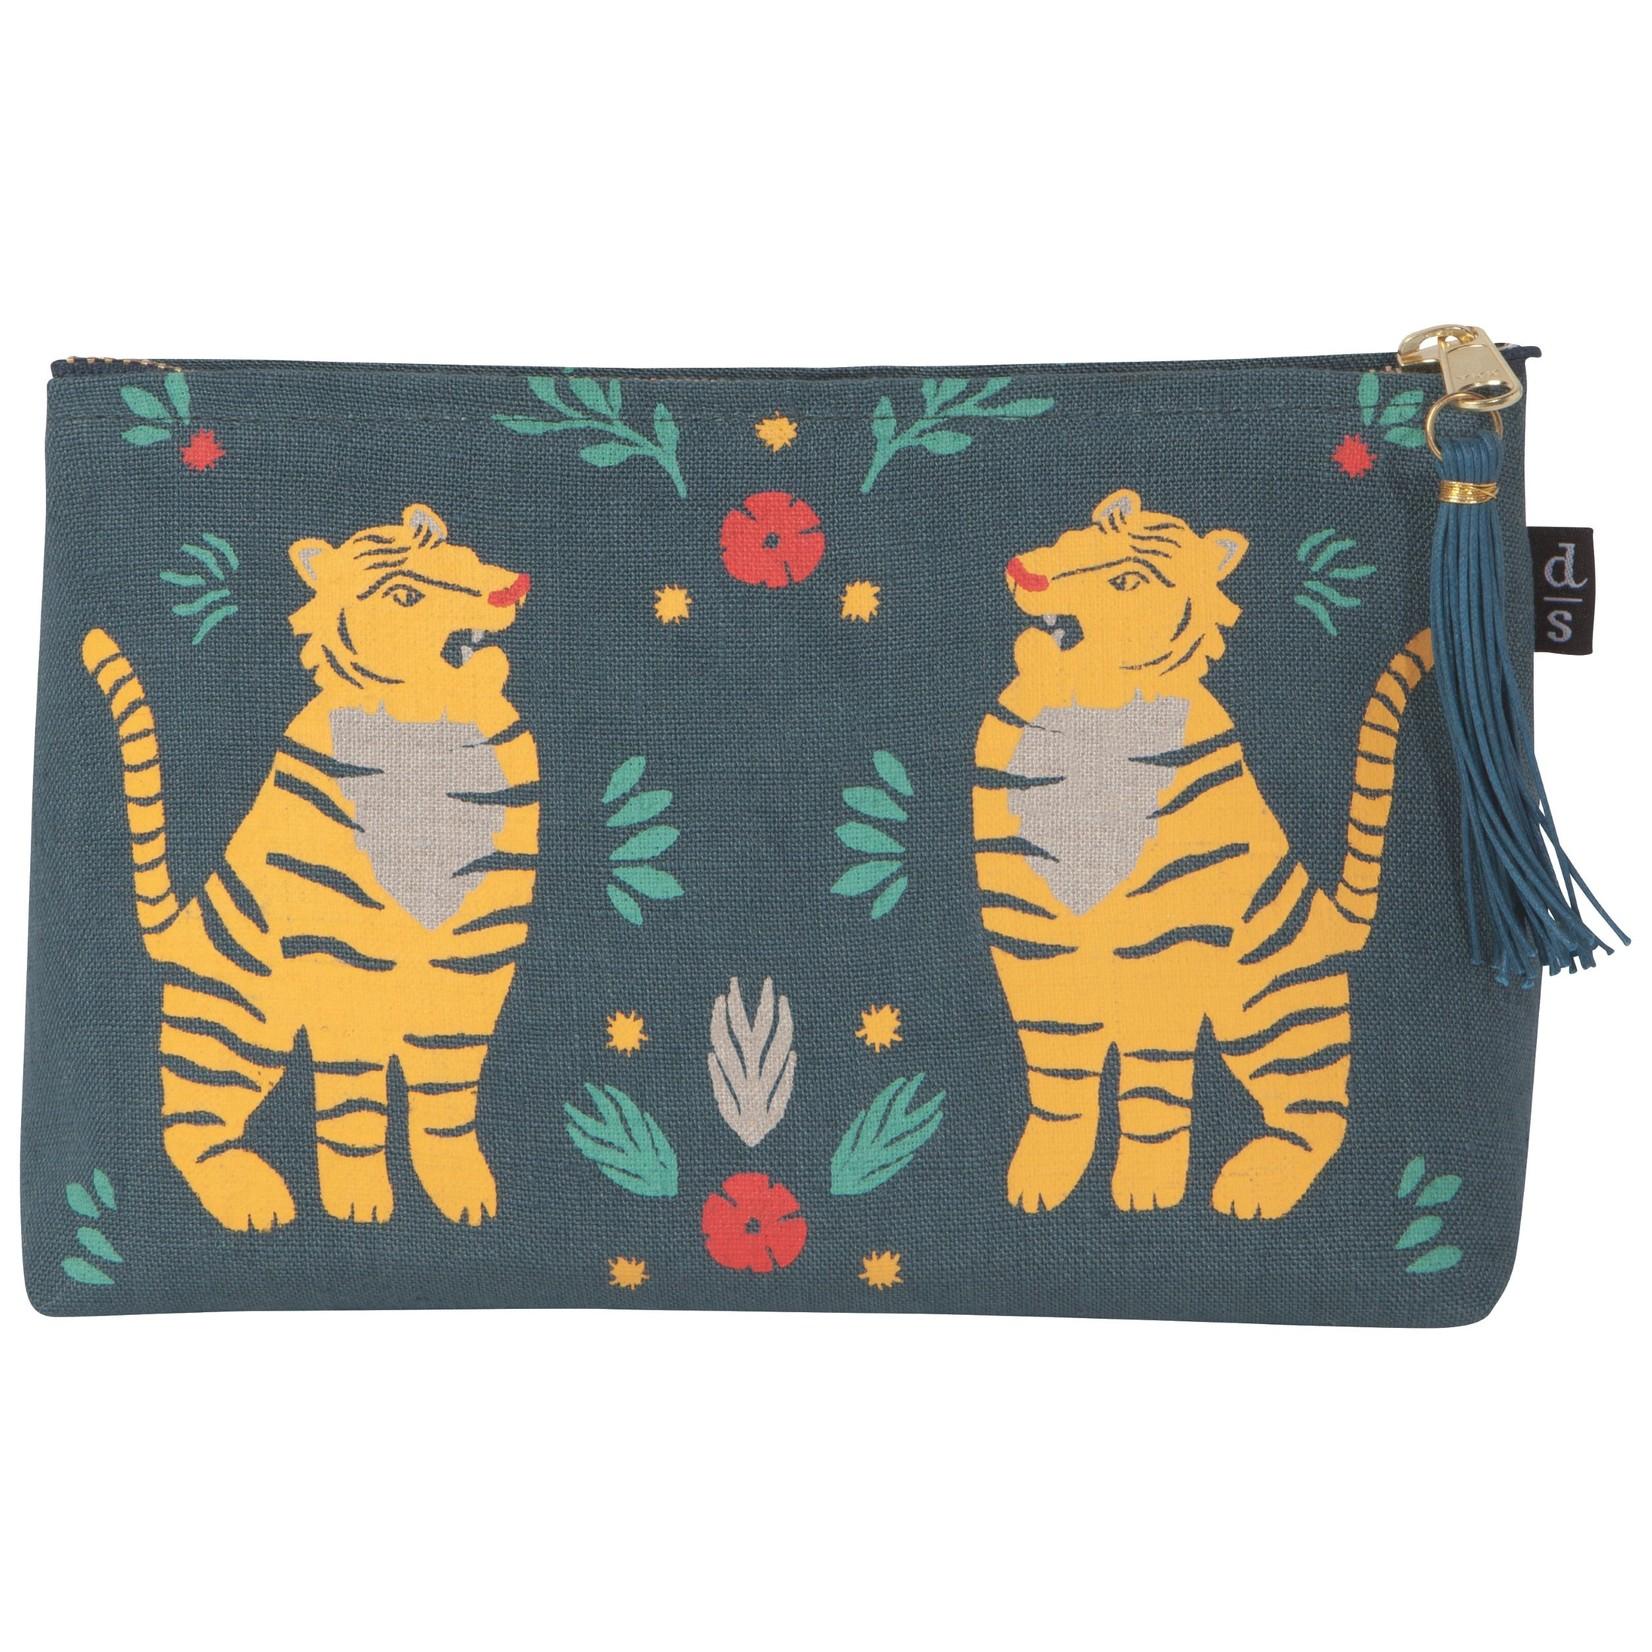 Danica Studio Small Cosmetic Bag